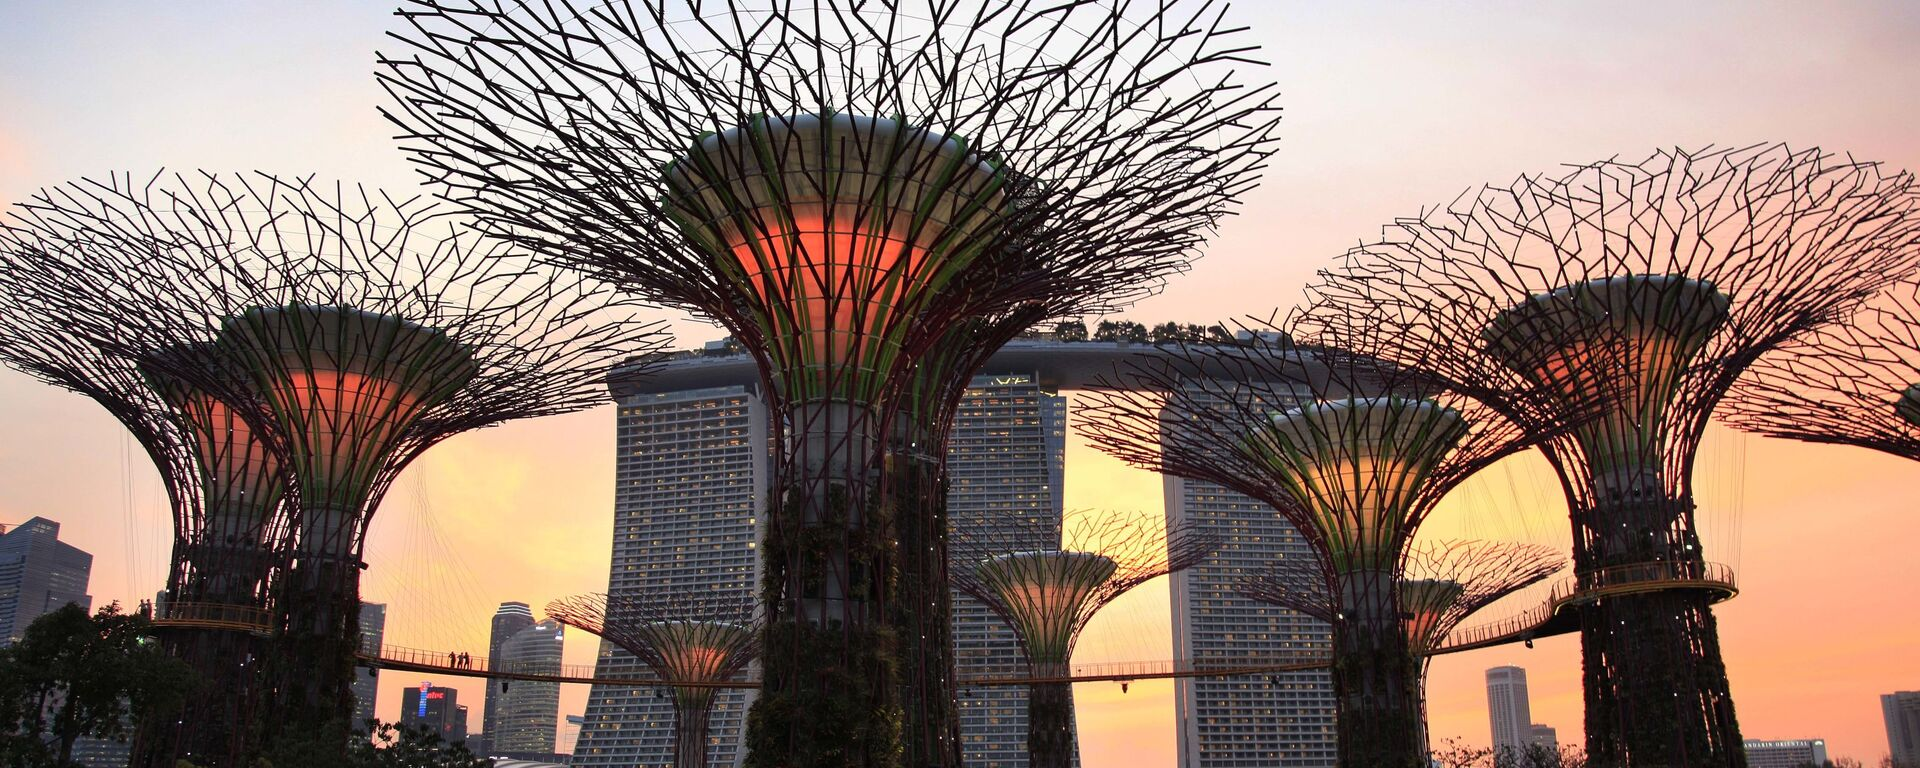 Super stromy, Singapur - Sputnik Česká republika, 1920, 01.07.2021